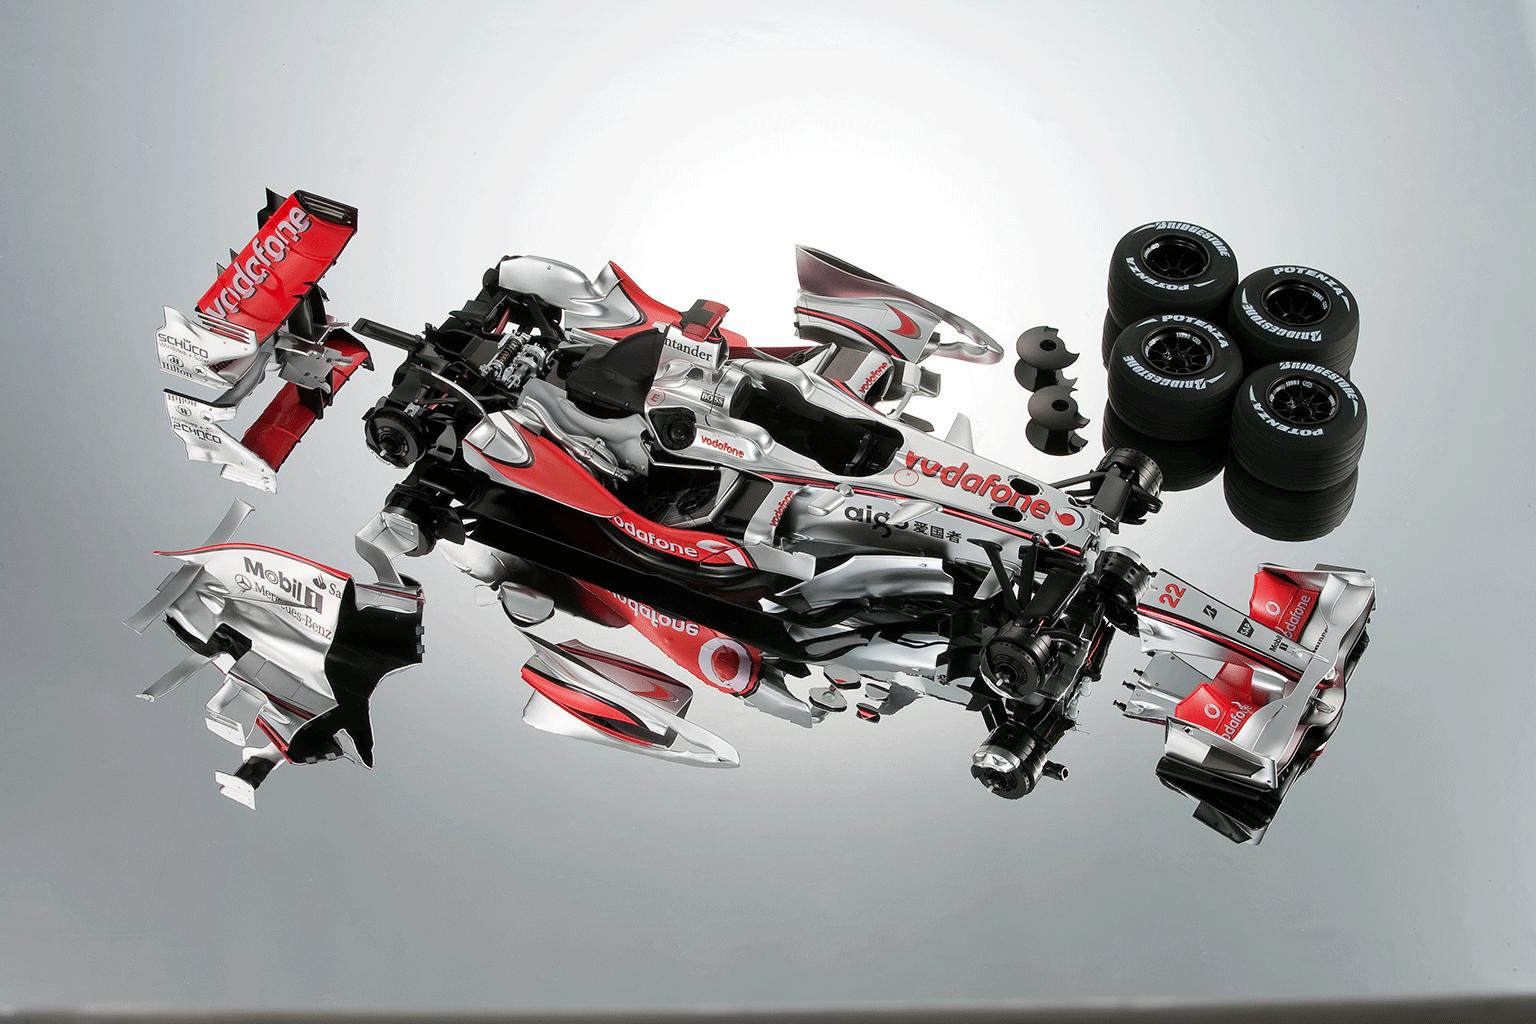 Mclaren Kit Car >> McLaren MP4-23   ModelSpace